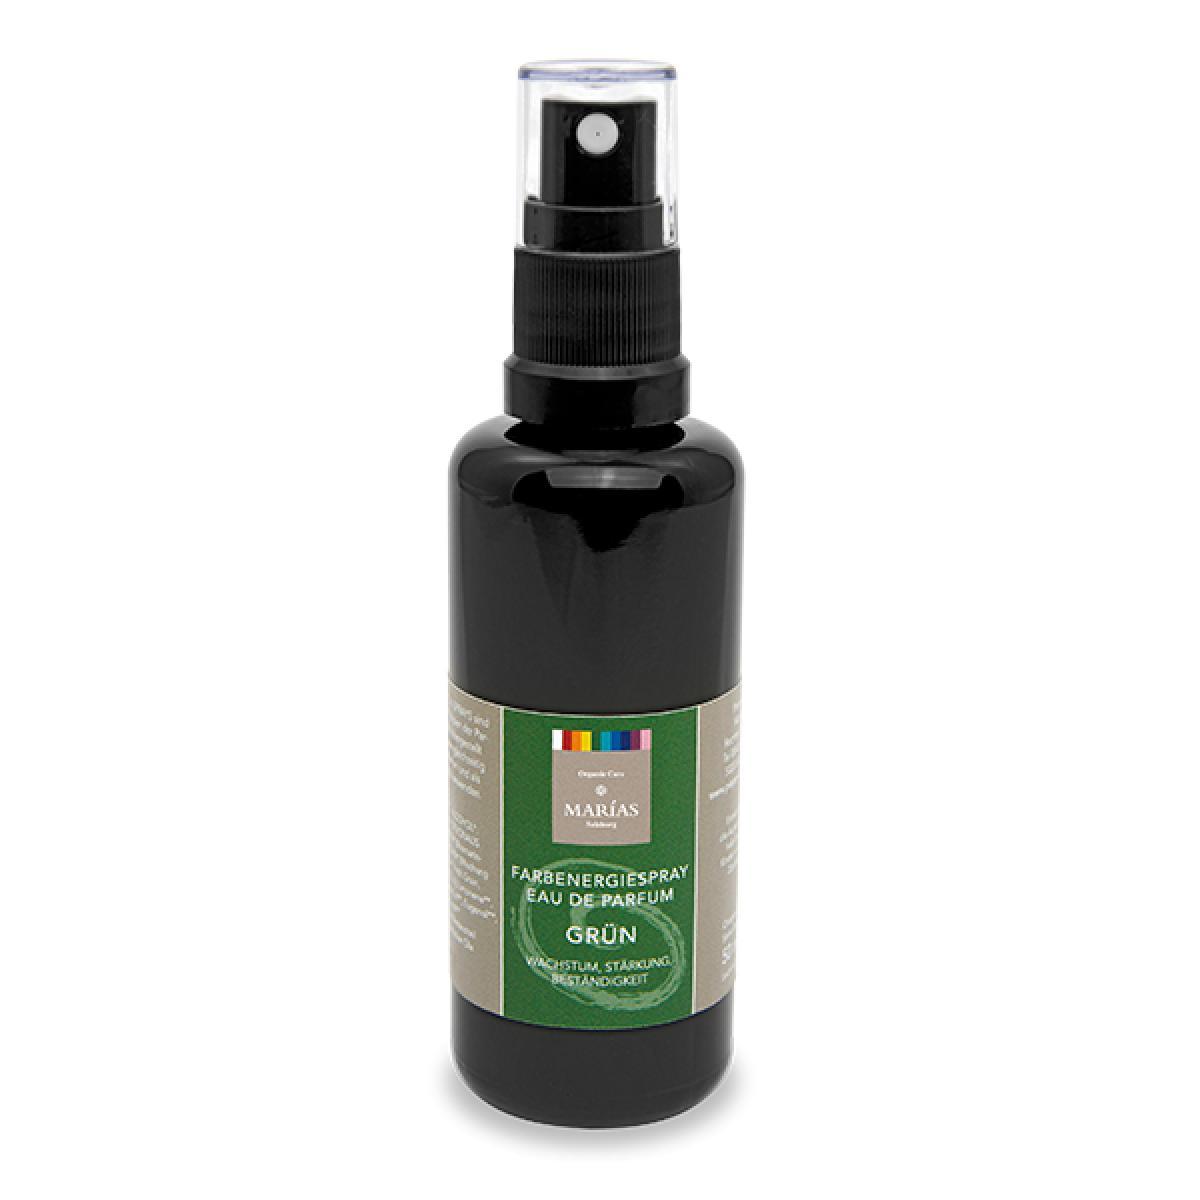 mar as farbenergie spray eau de parfum gr n 50 ml. Black Bedroom Furniture Sets. Home Design Ideas